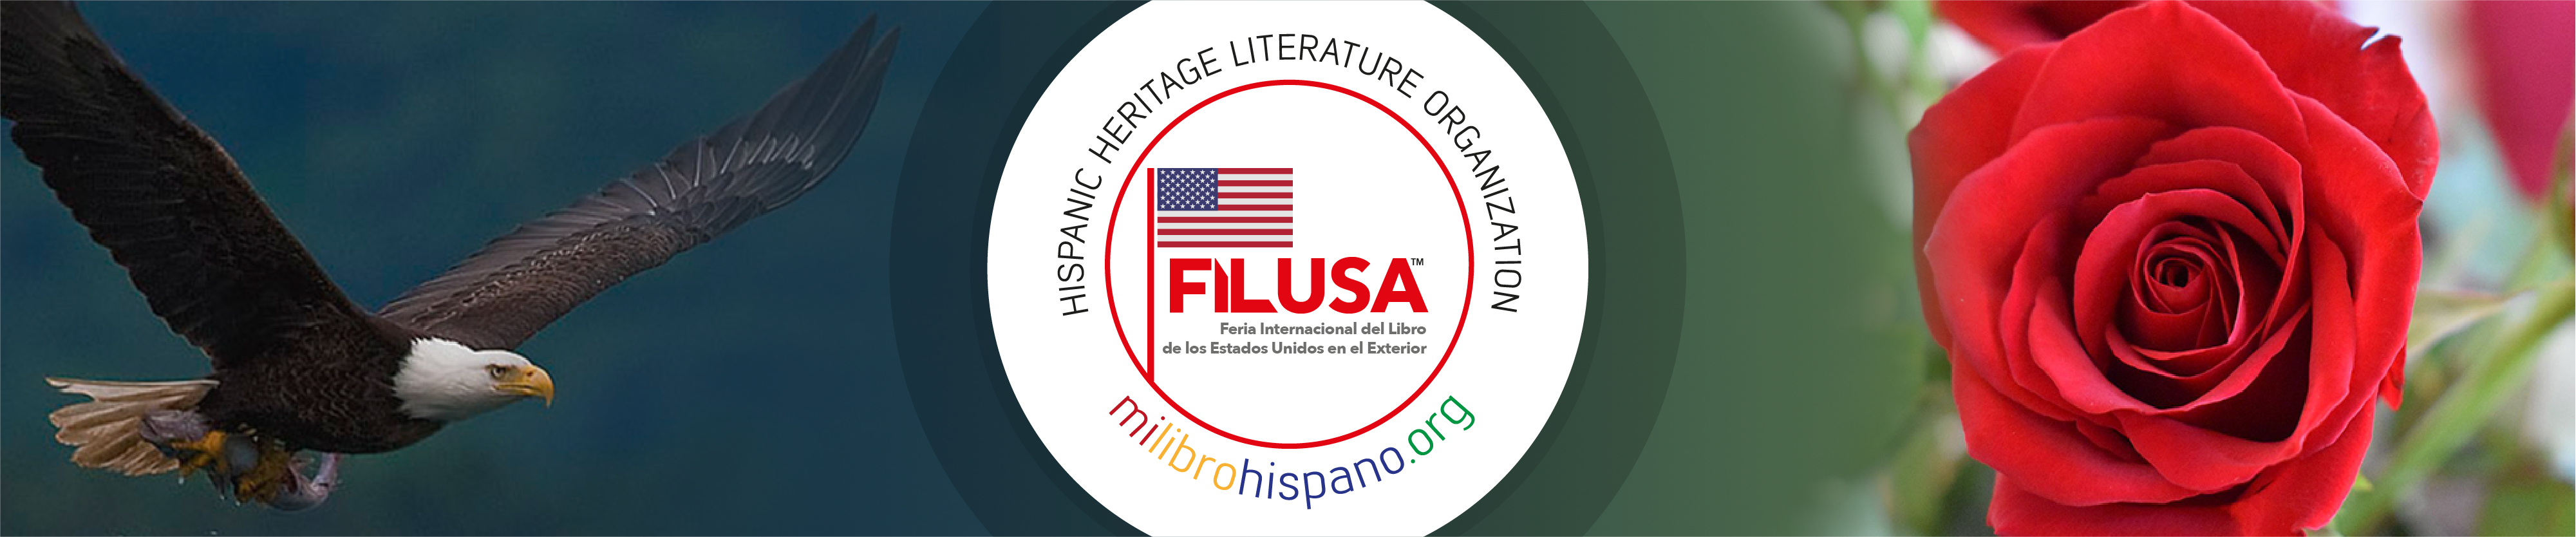 FIL Banner - Estados Unidos